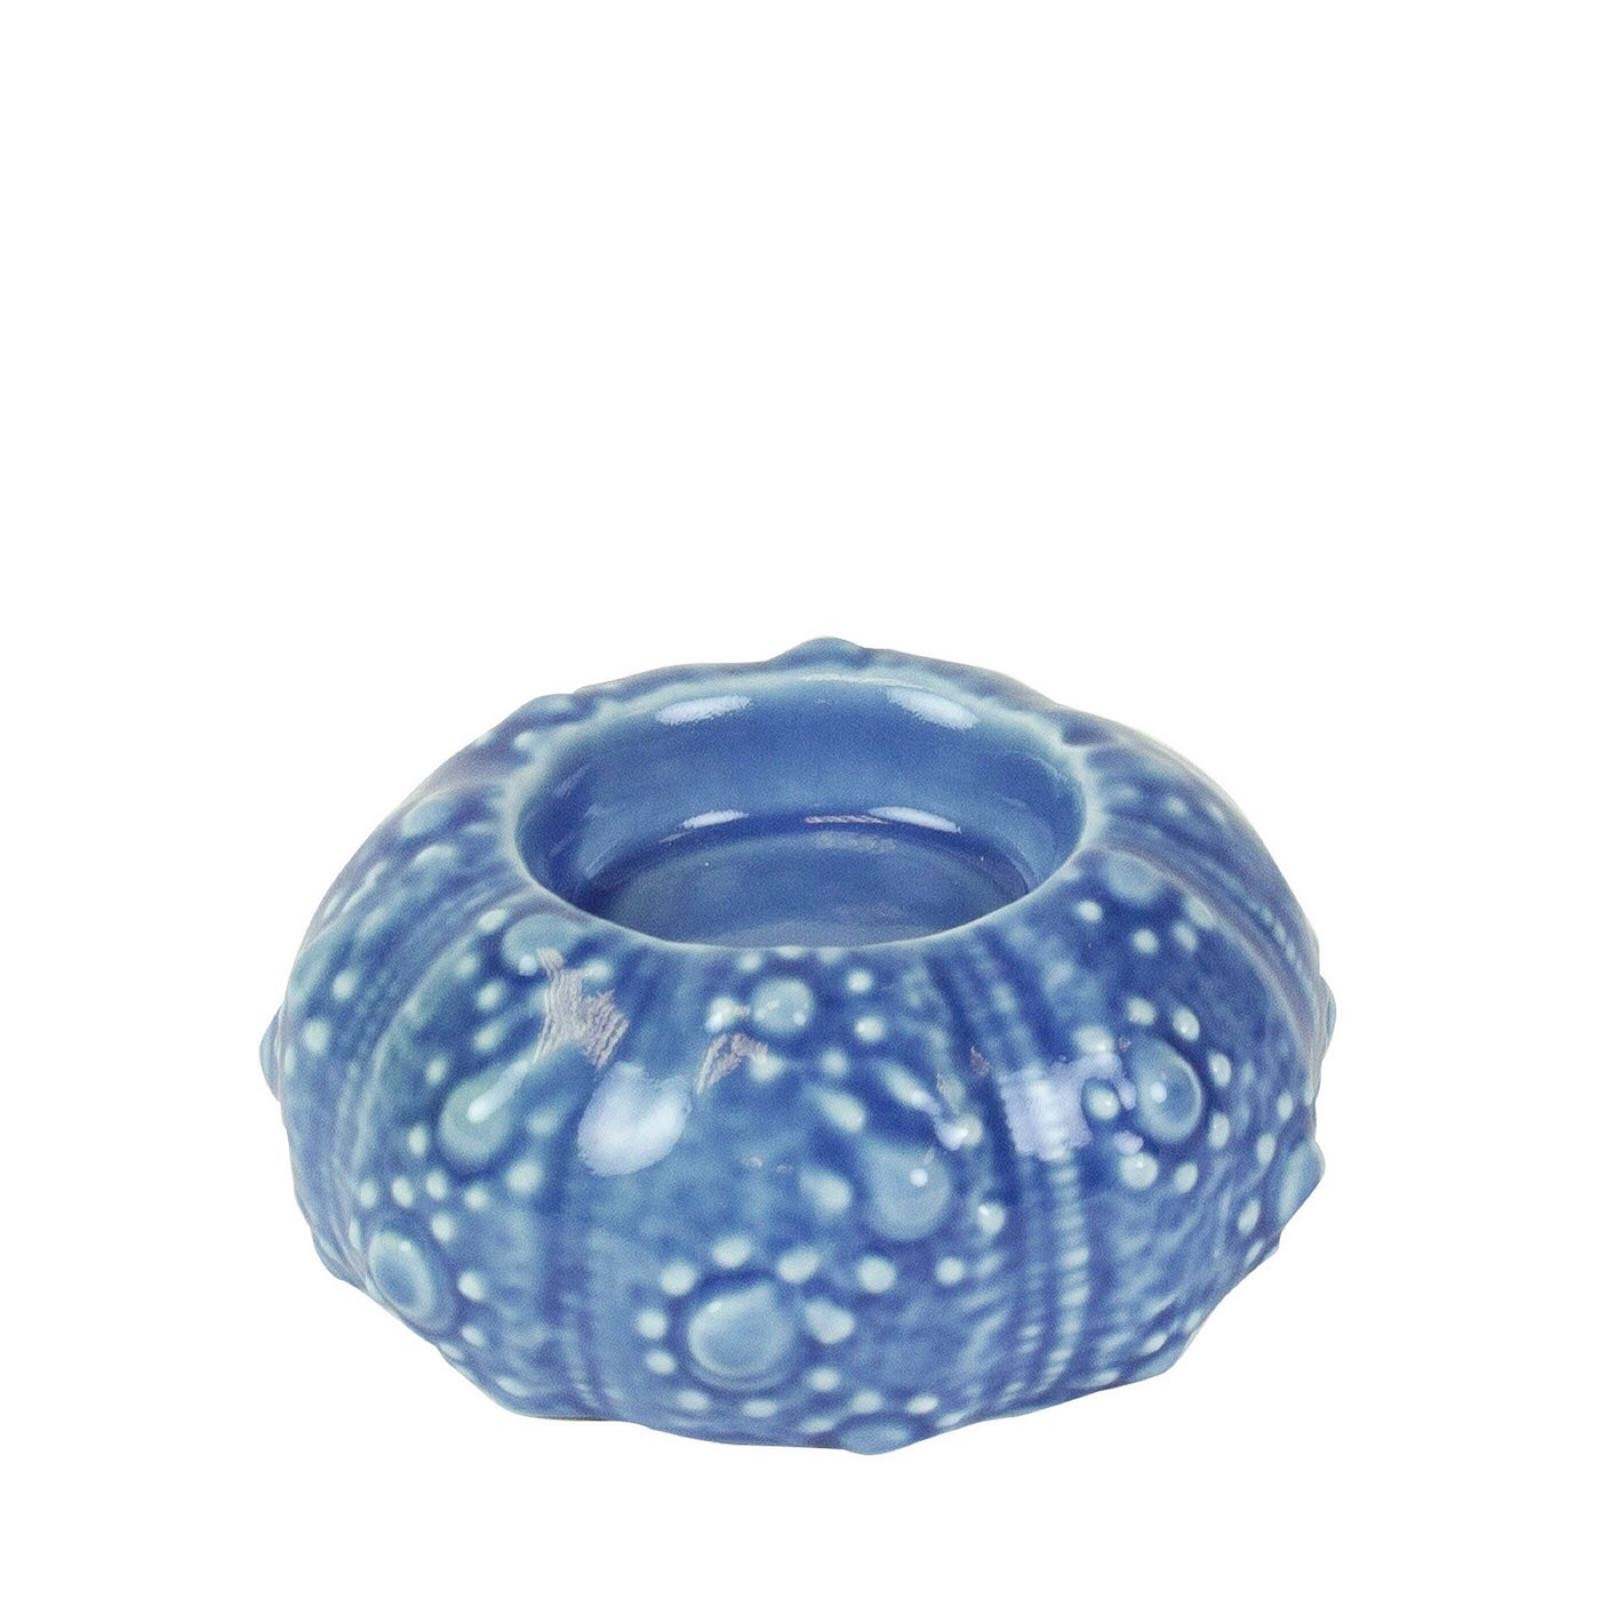 Blue Sea Urchin Tealight Holder SALE 25% (£3.95)